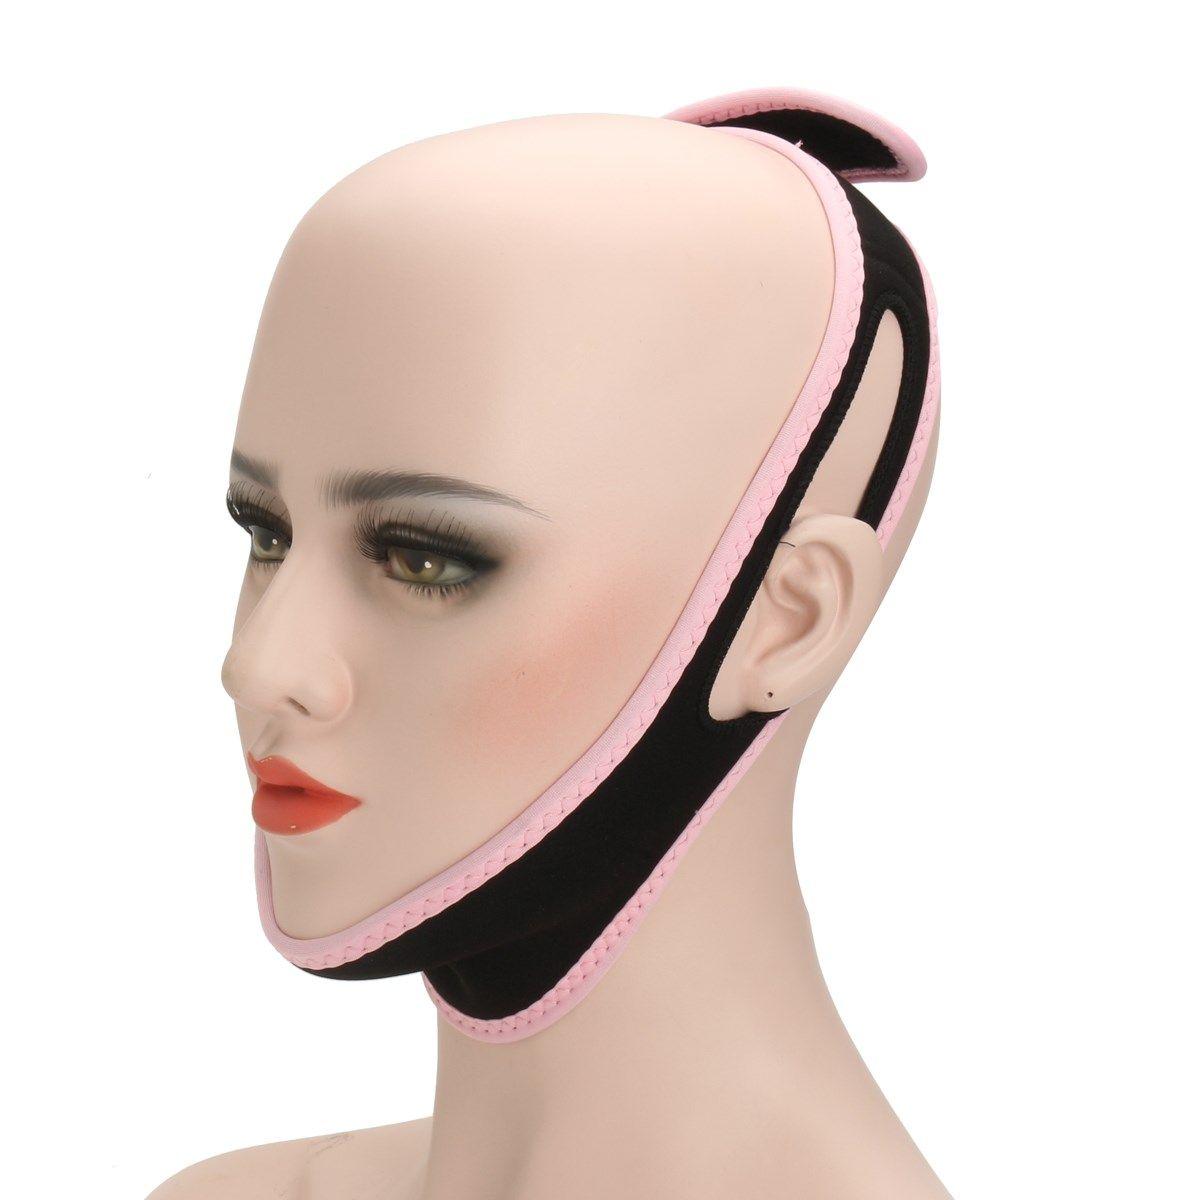 V Line Wajah Ultra Tipis Anti Aging Kerut Pipi Chin Facial Masker New Look Face Beauty Lift Up Belt Pink Peramping Pro 1 Pcs Tidur Pembentuk Slimming Perban